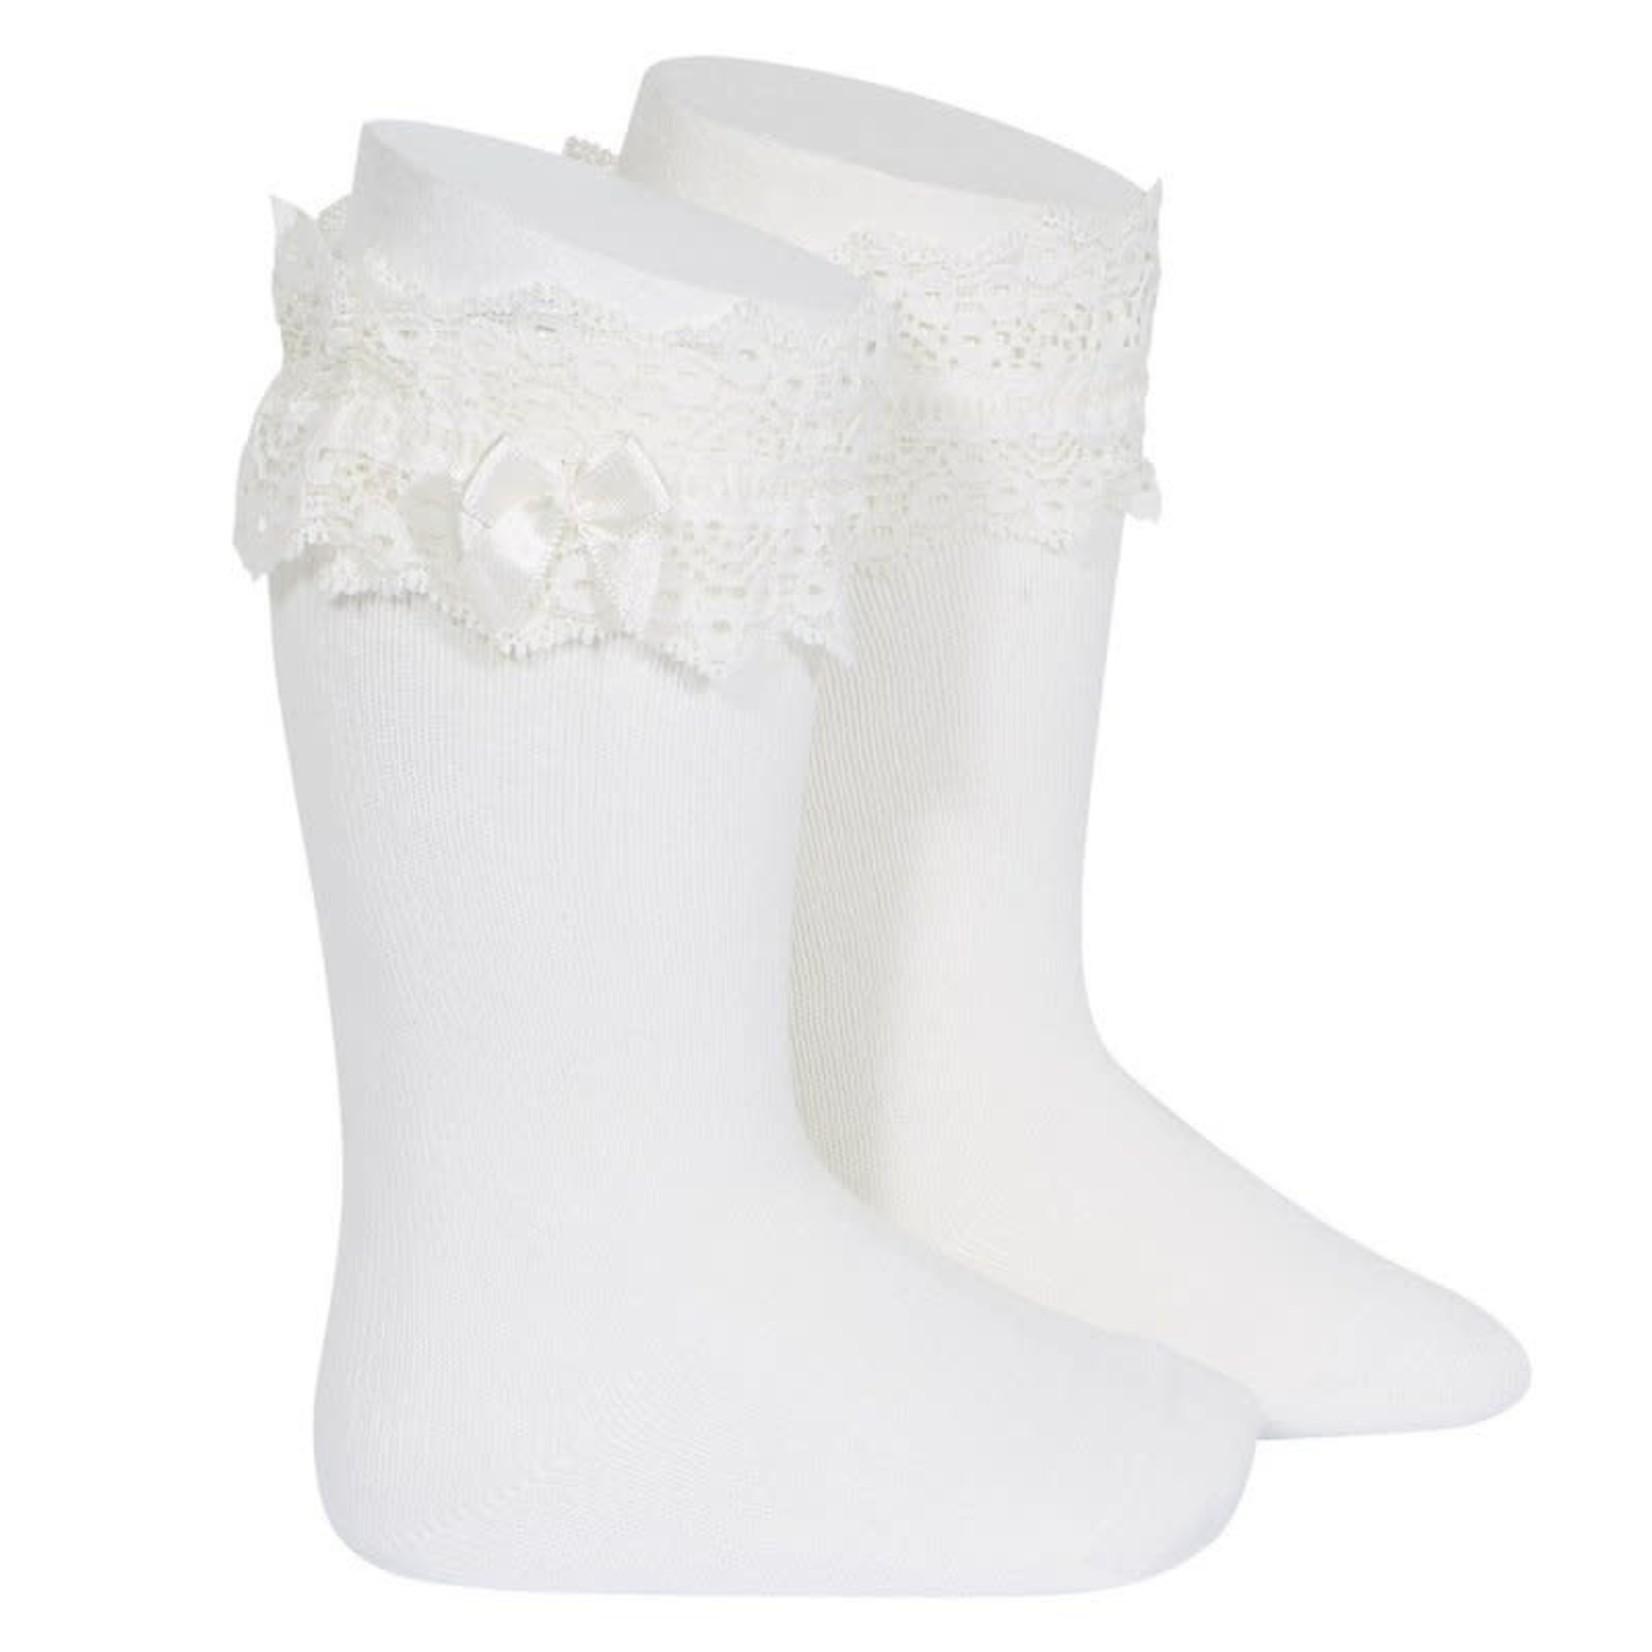 Condor Fantasy Socks Knee High - Offwhite